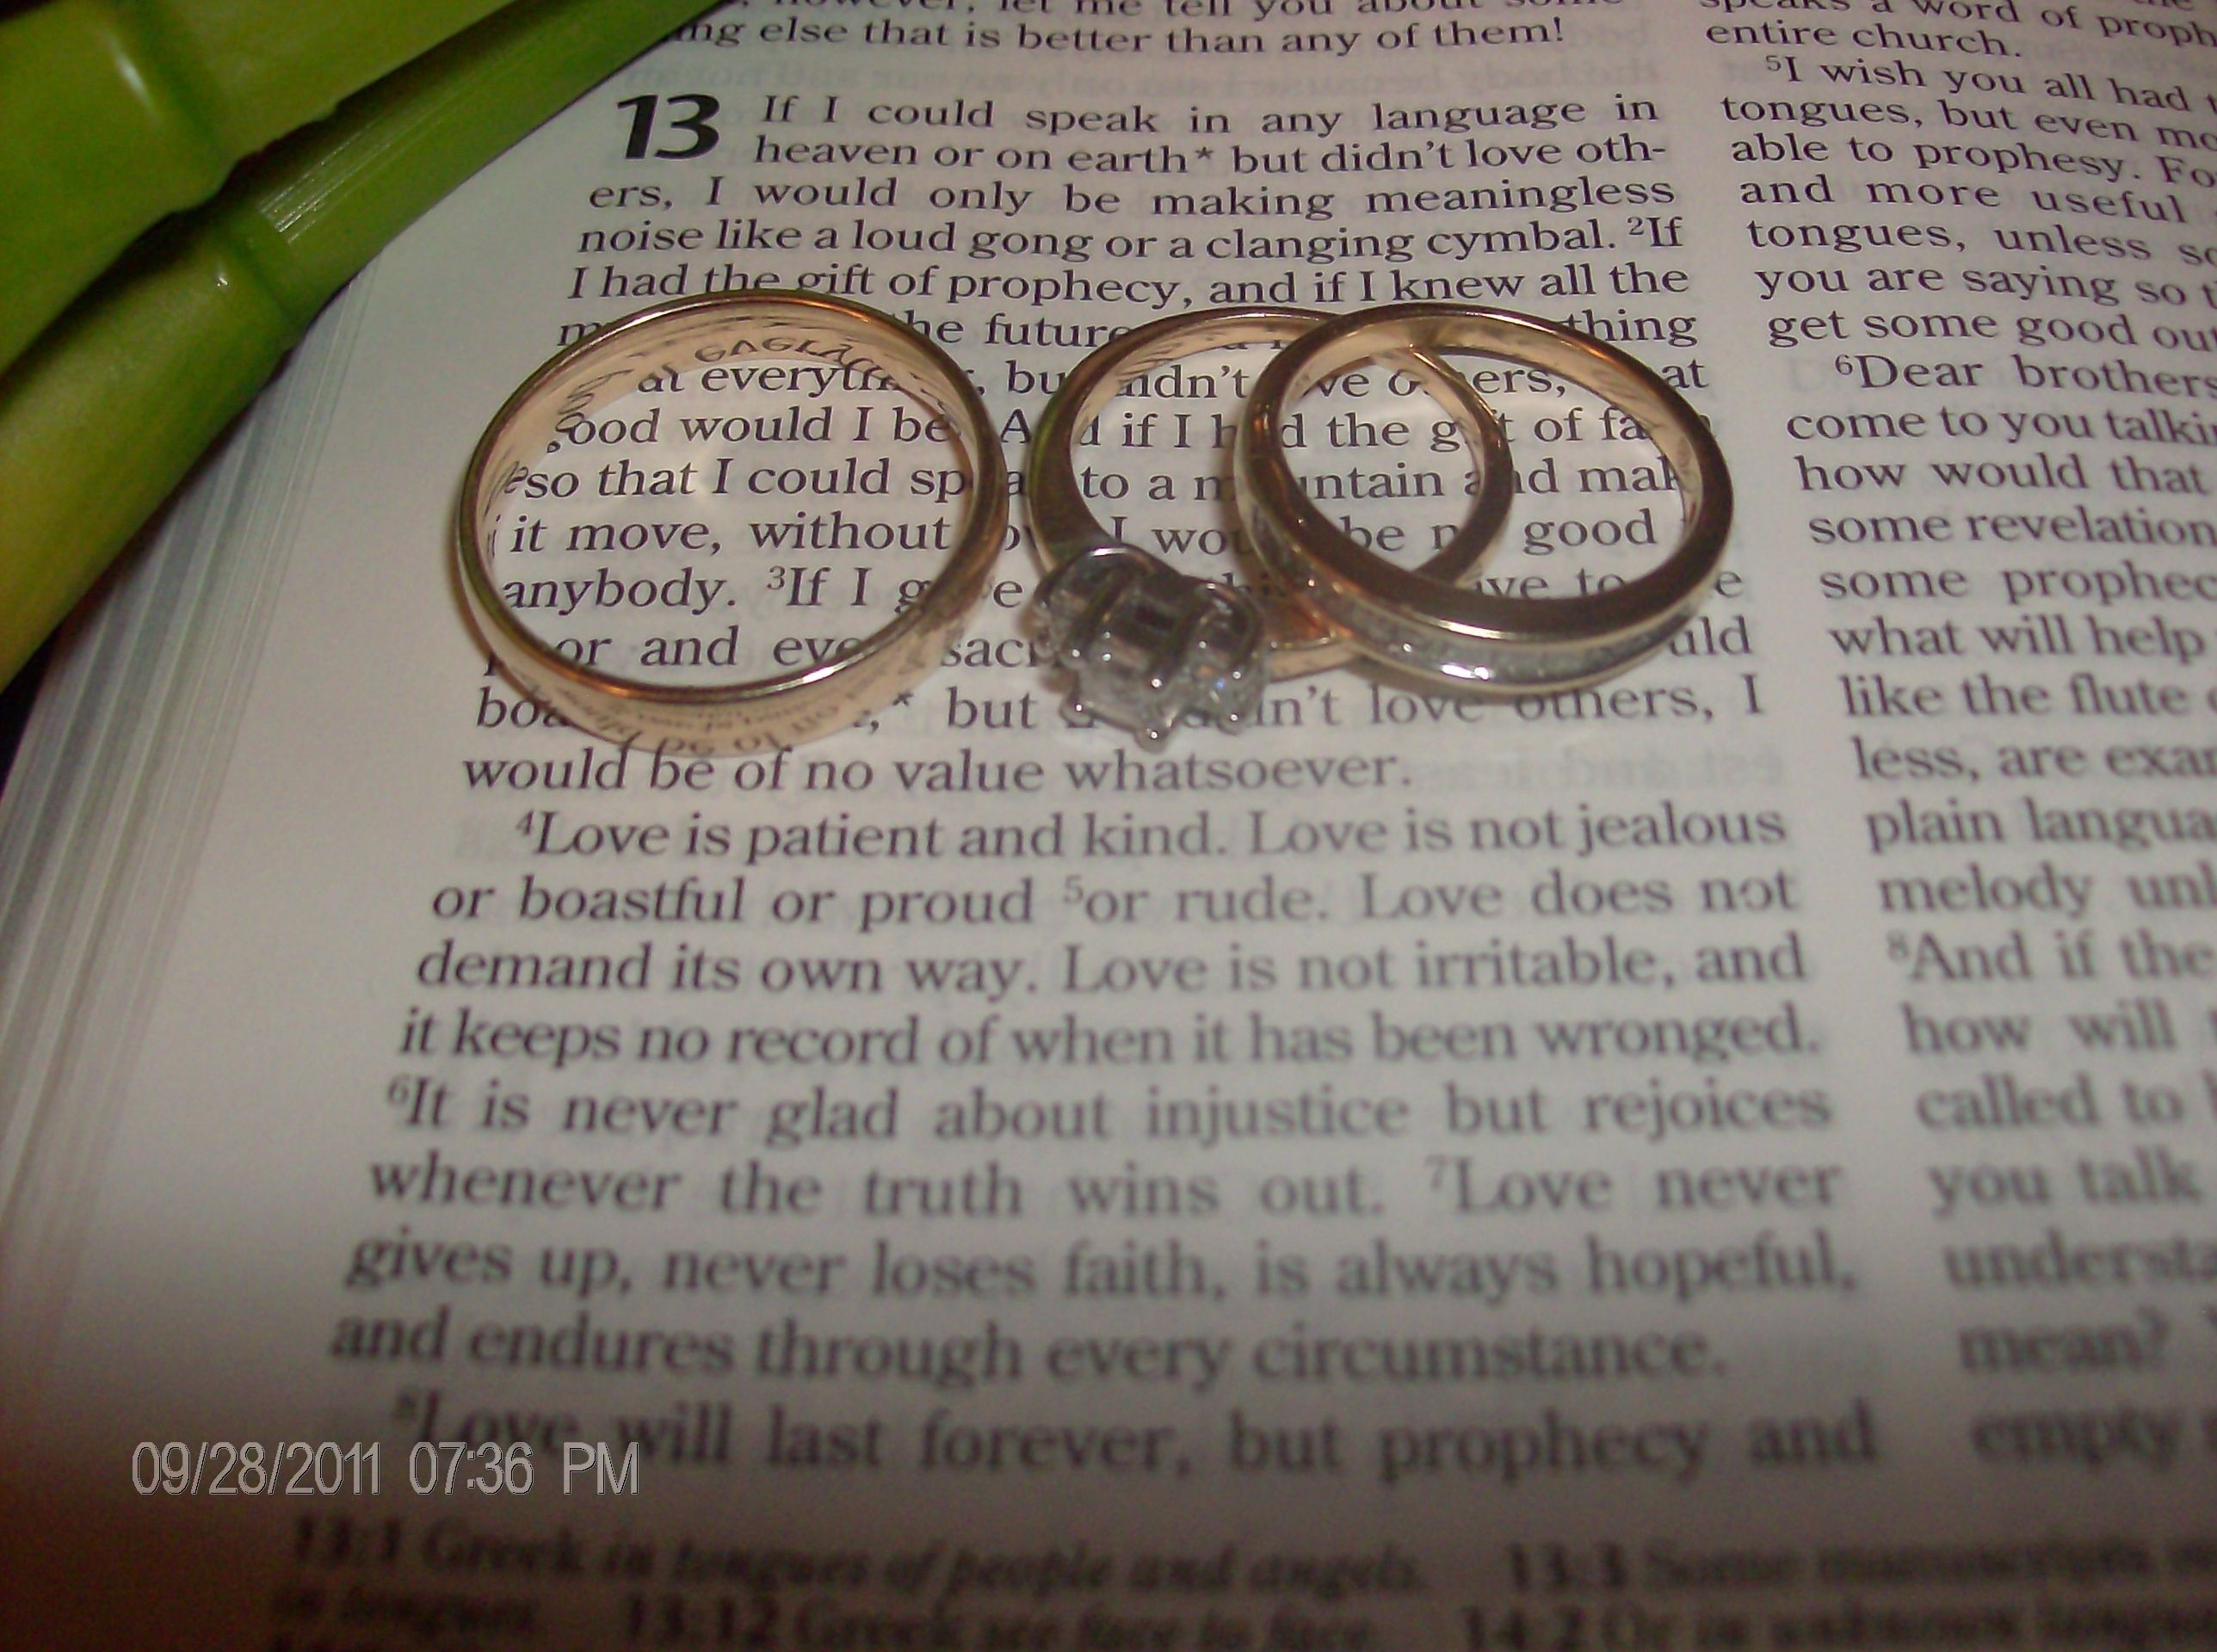 Our wedding rings on my favorite bible verse 1 corinthians 13 4 13